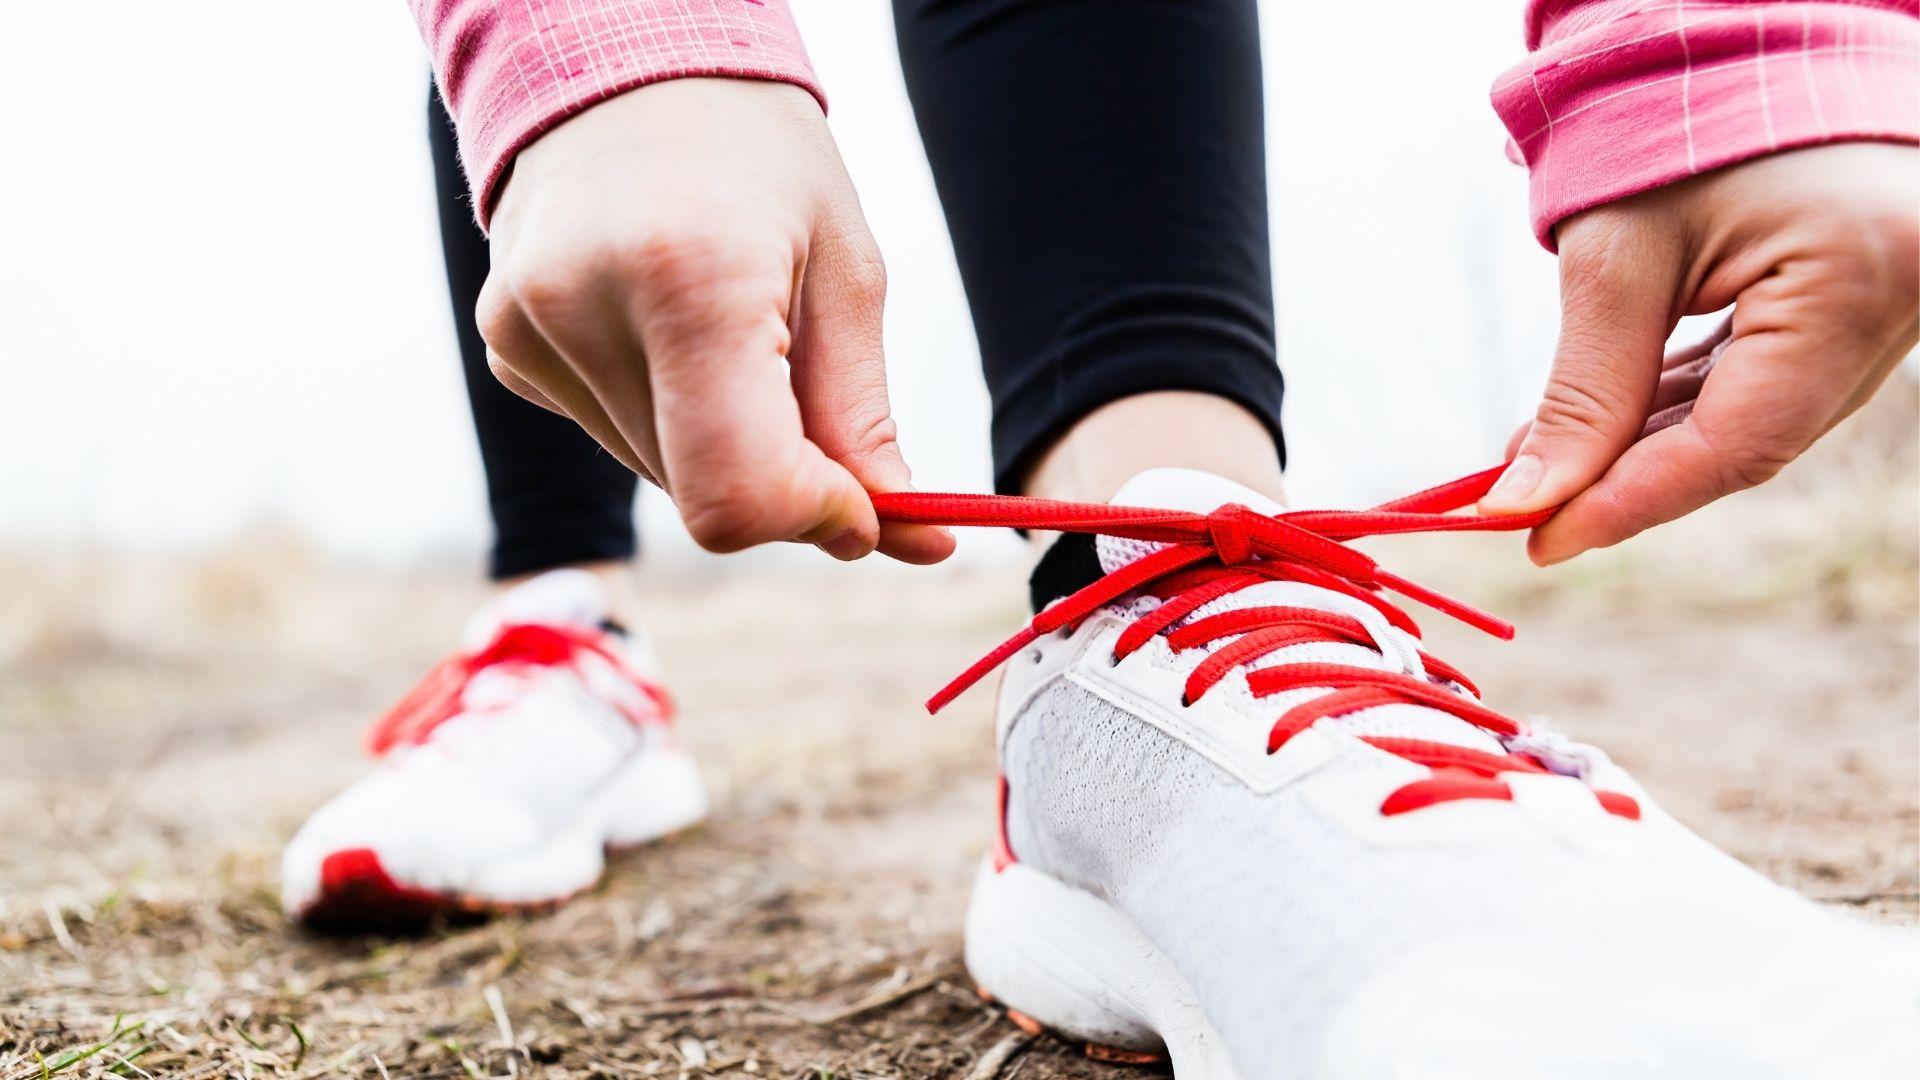 person tying shoe